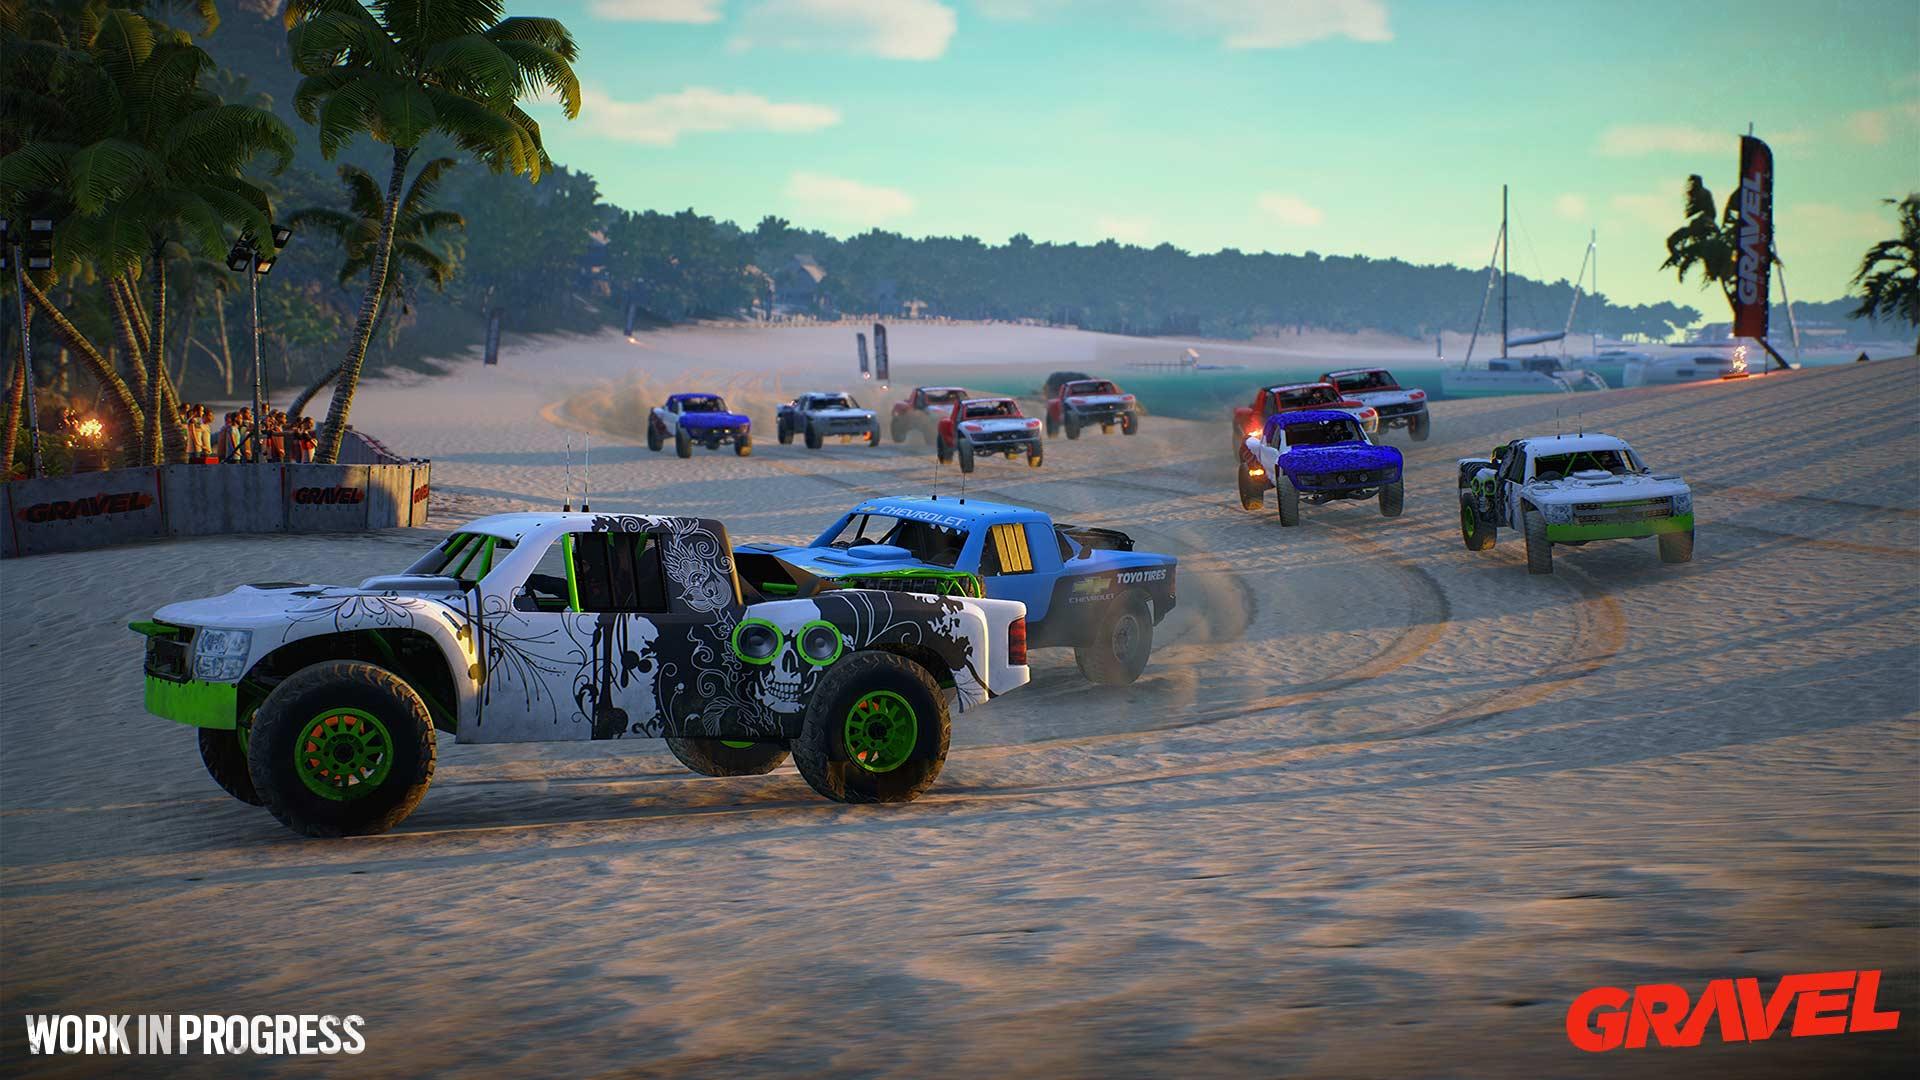 Gravel wip trophy trucks beach